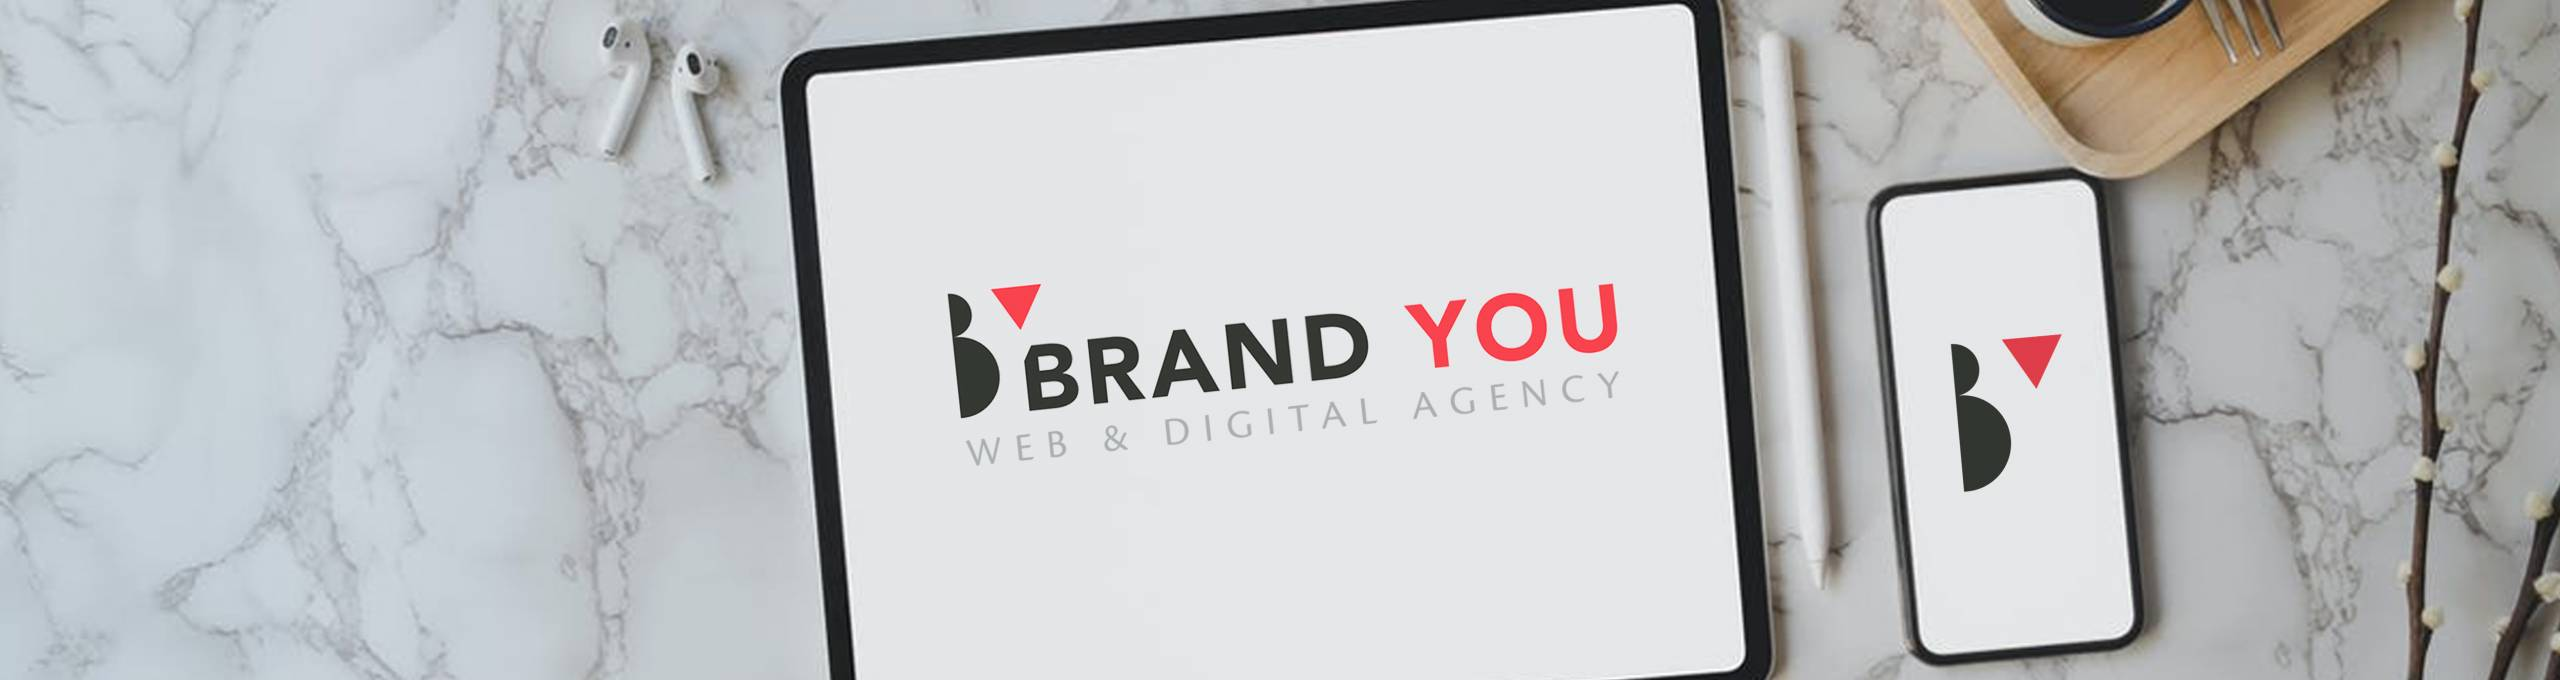 banner-marketing-dev